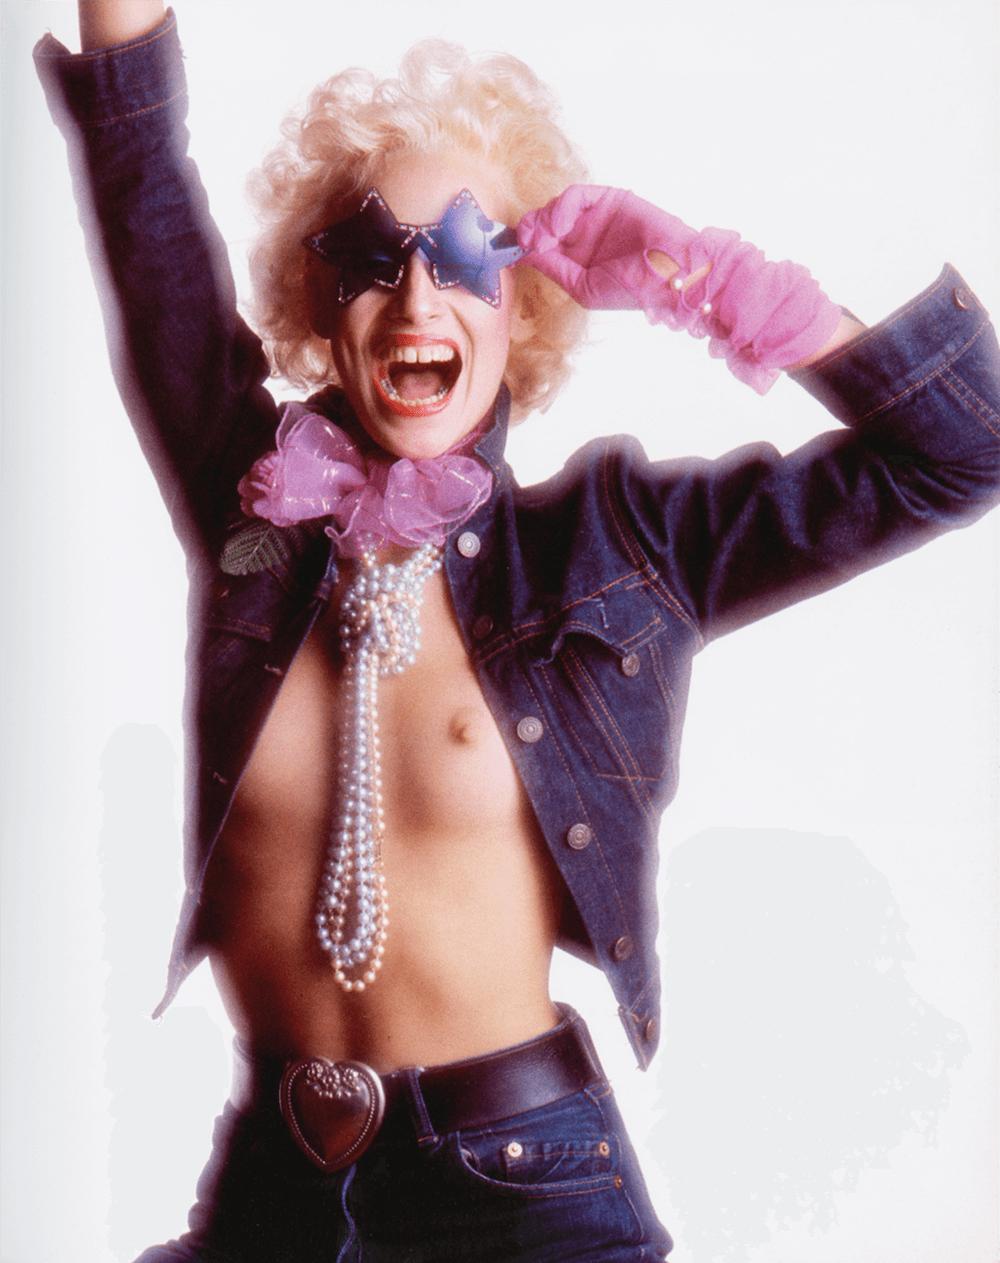 Секс мода диско смотреть фото